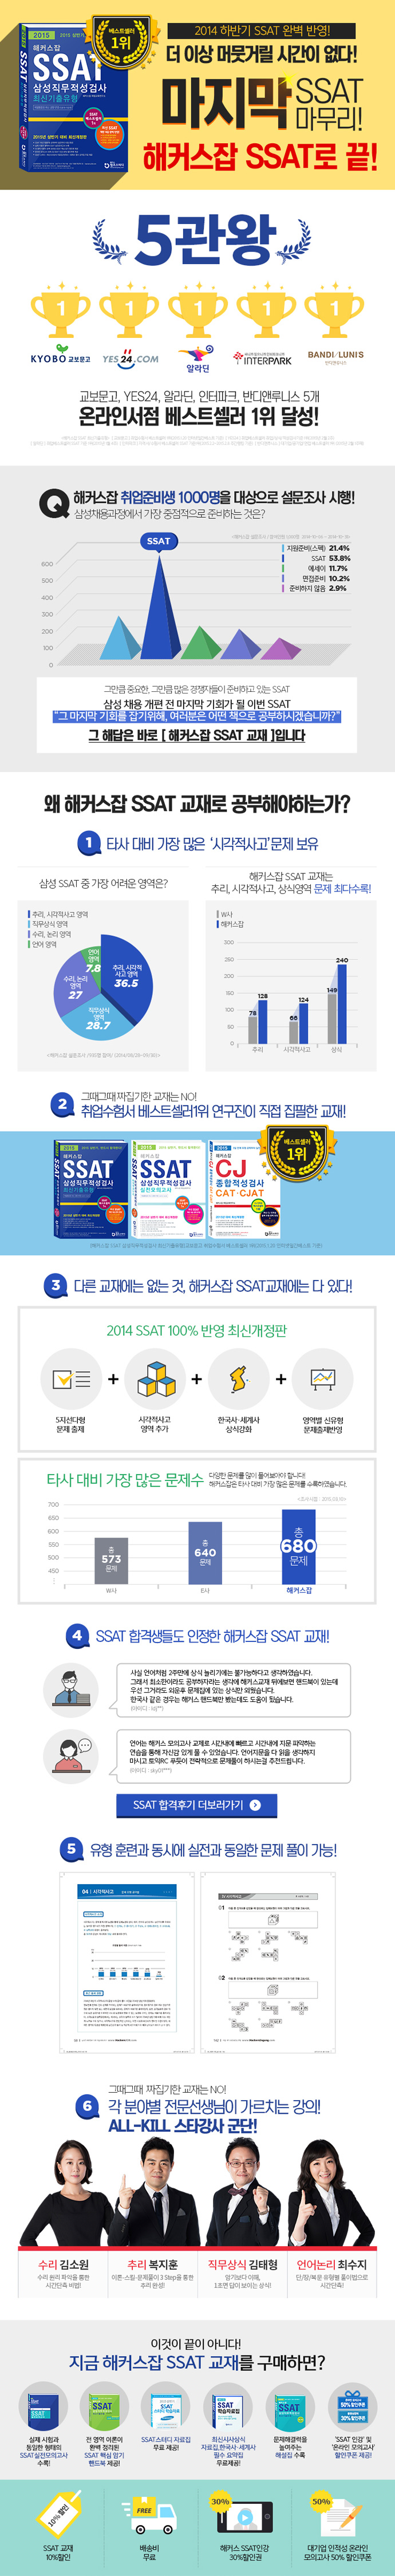 SSAT 삼성직무적성검사 최신기출유형(2015)(해커스잡)(개정판) 도서 상세이미지